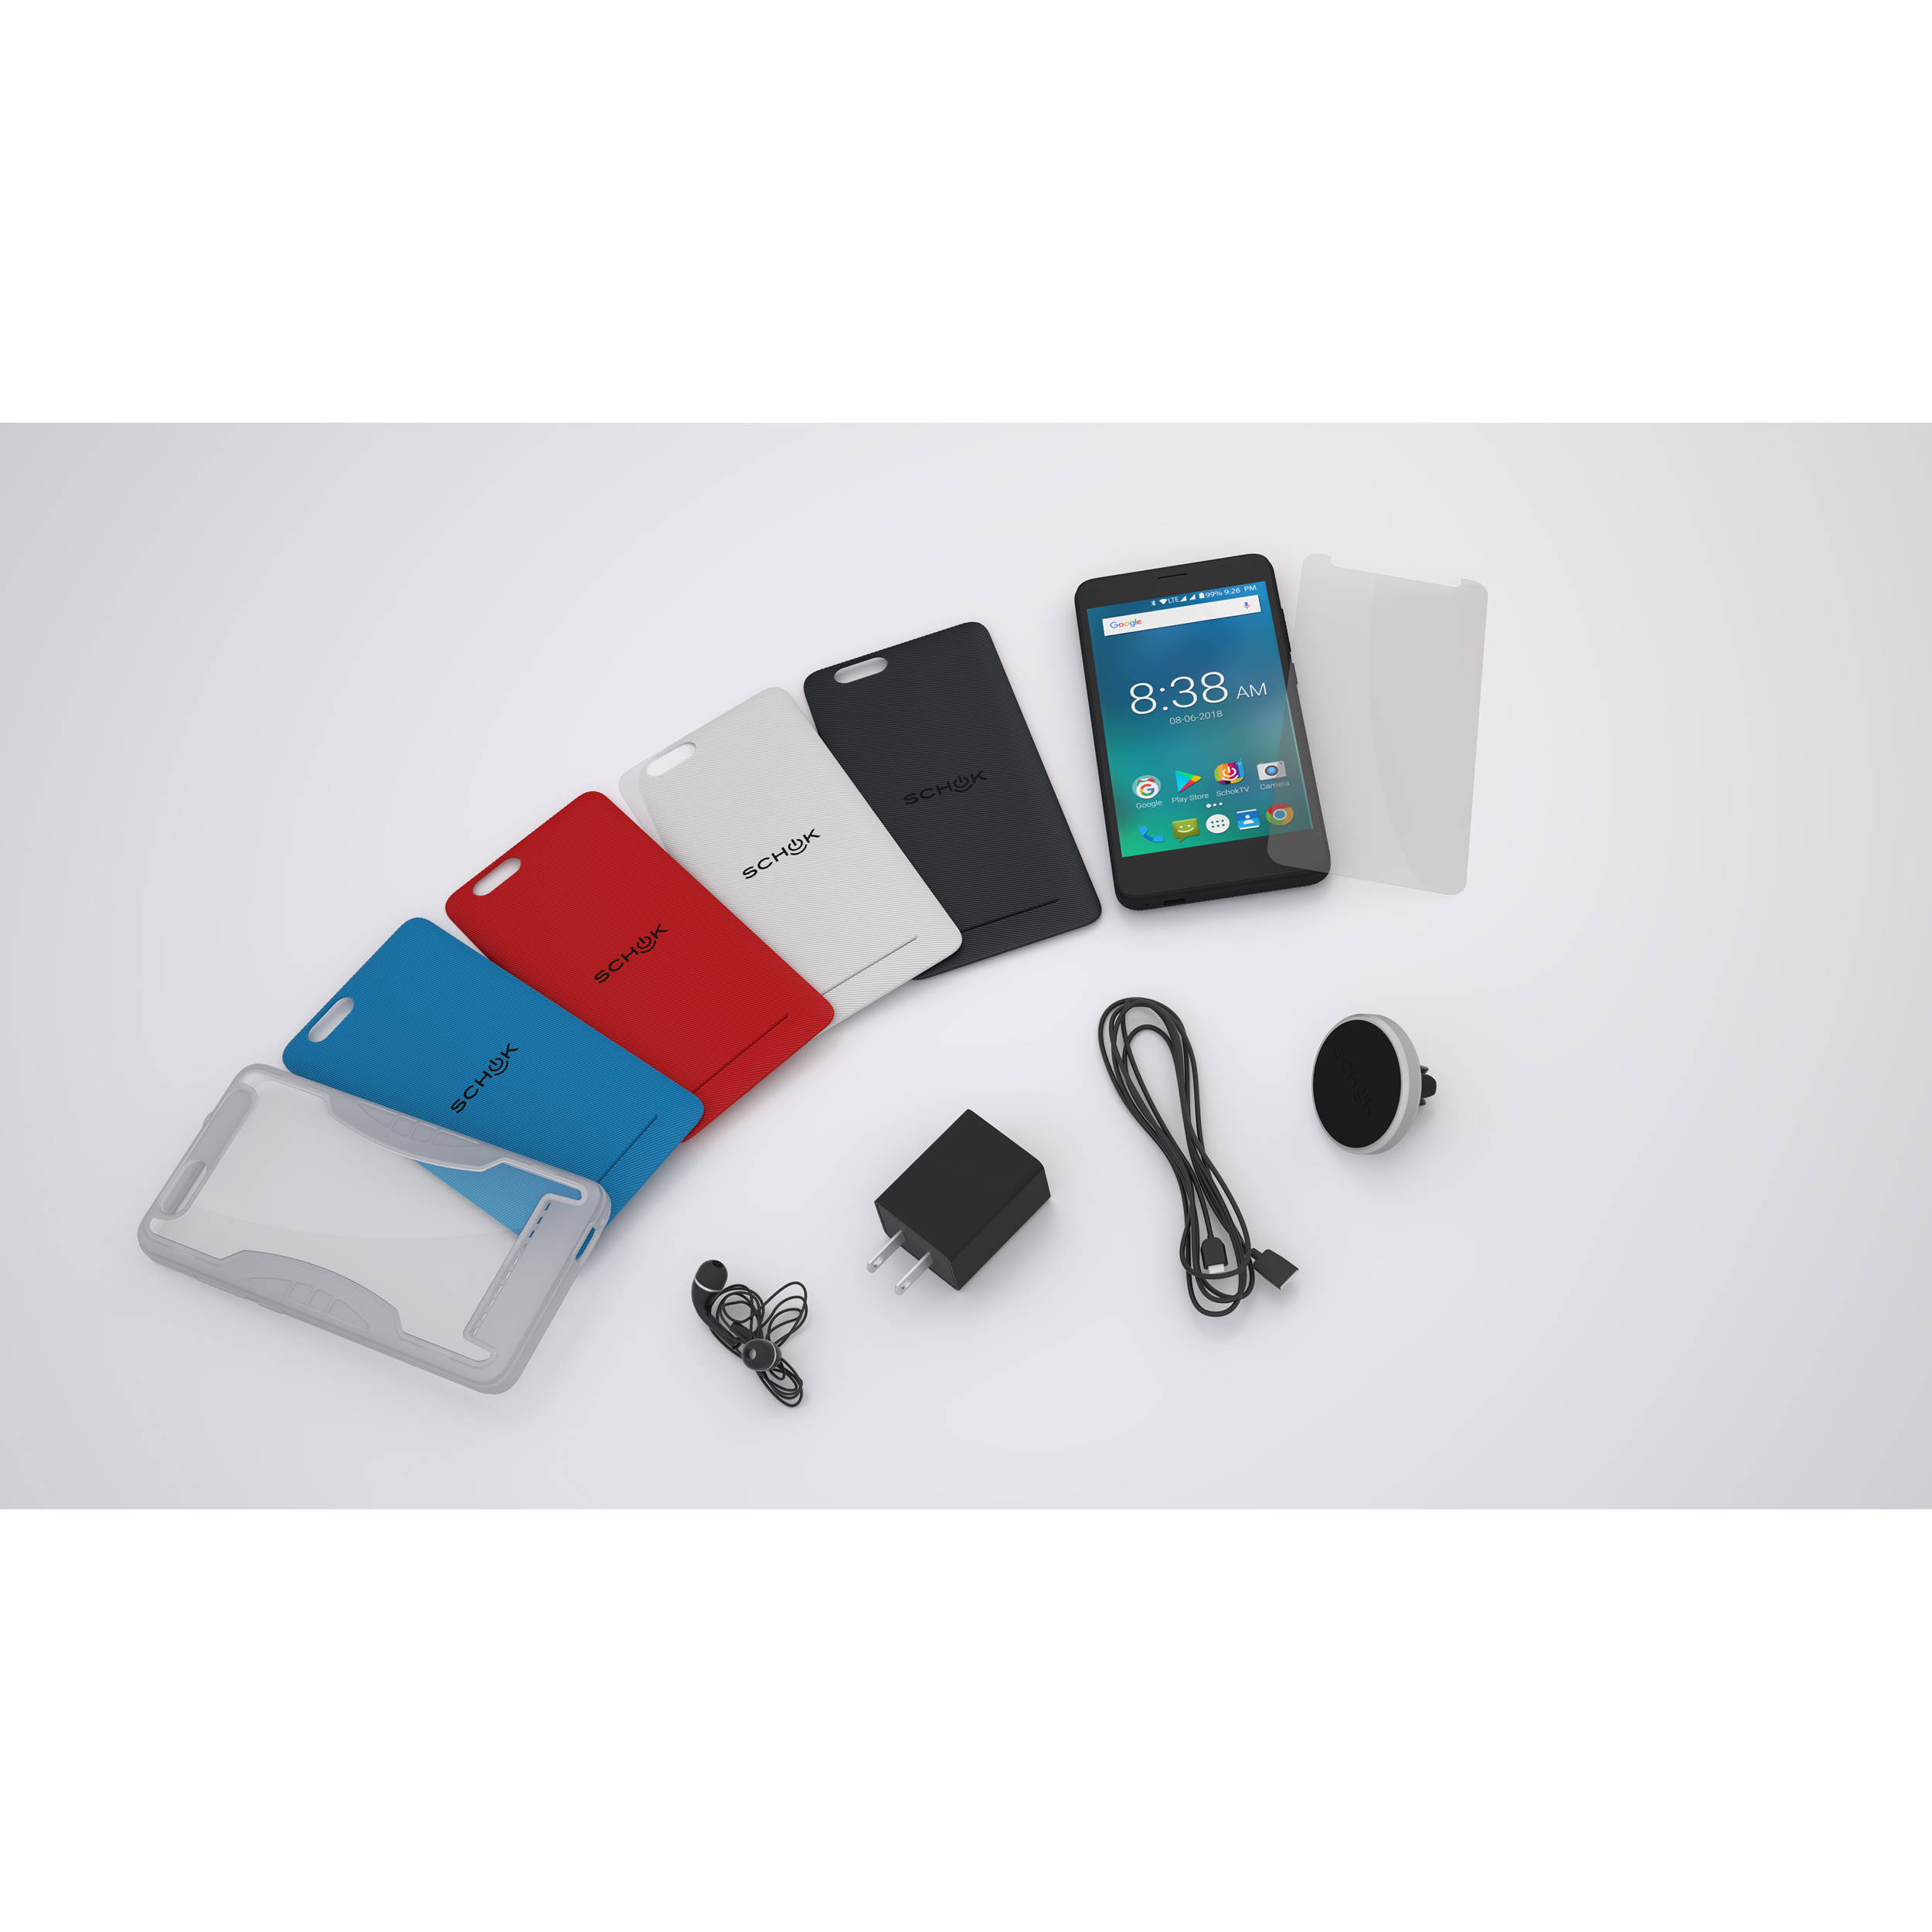 SCHOK Freedom Turbo 16GB Smartphone (Unlocked / Multicolor)